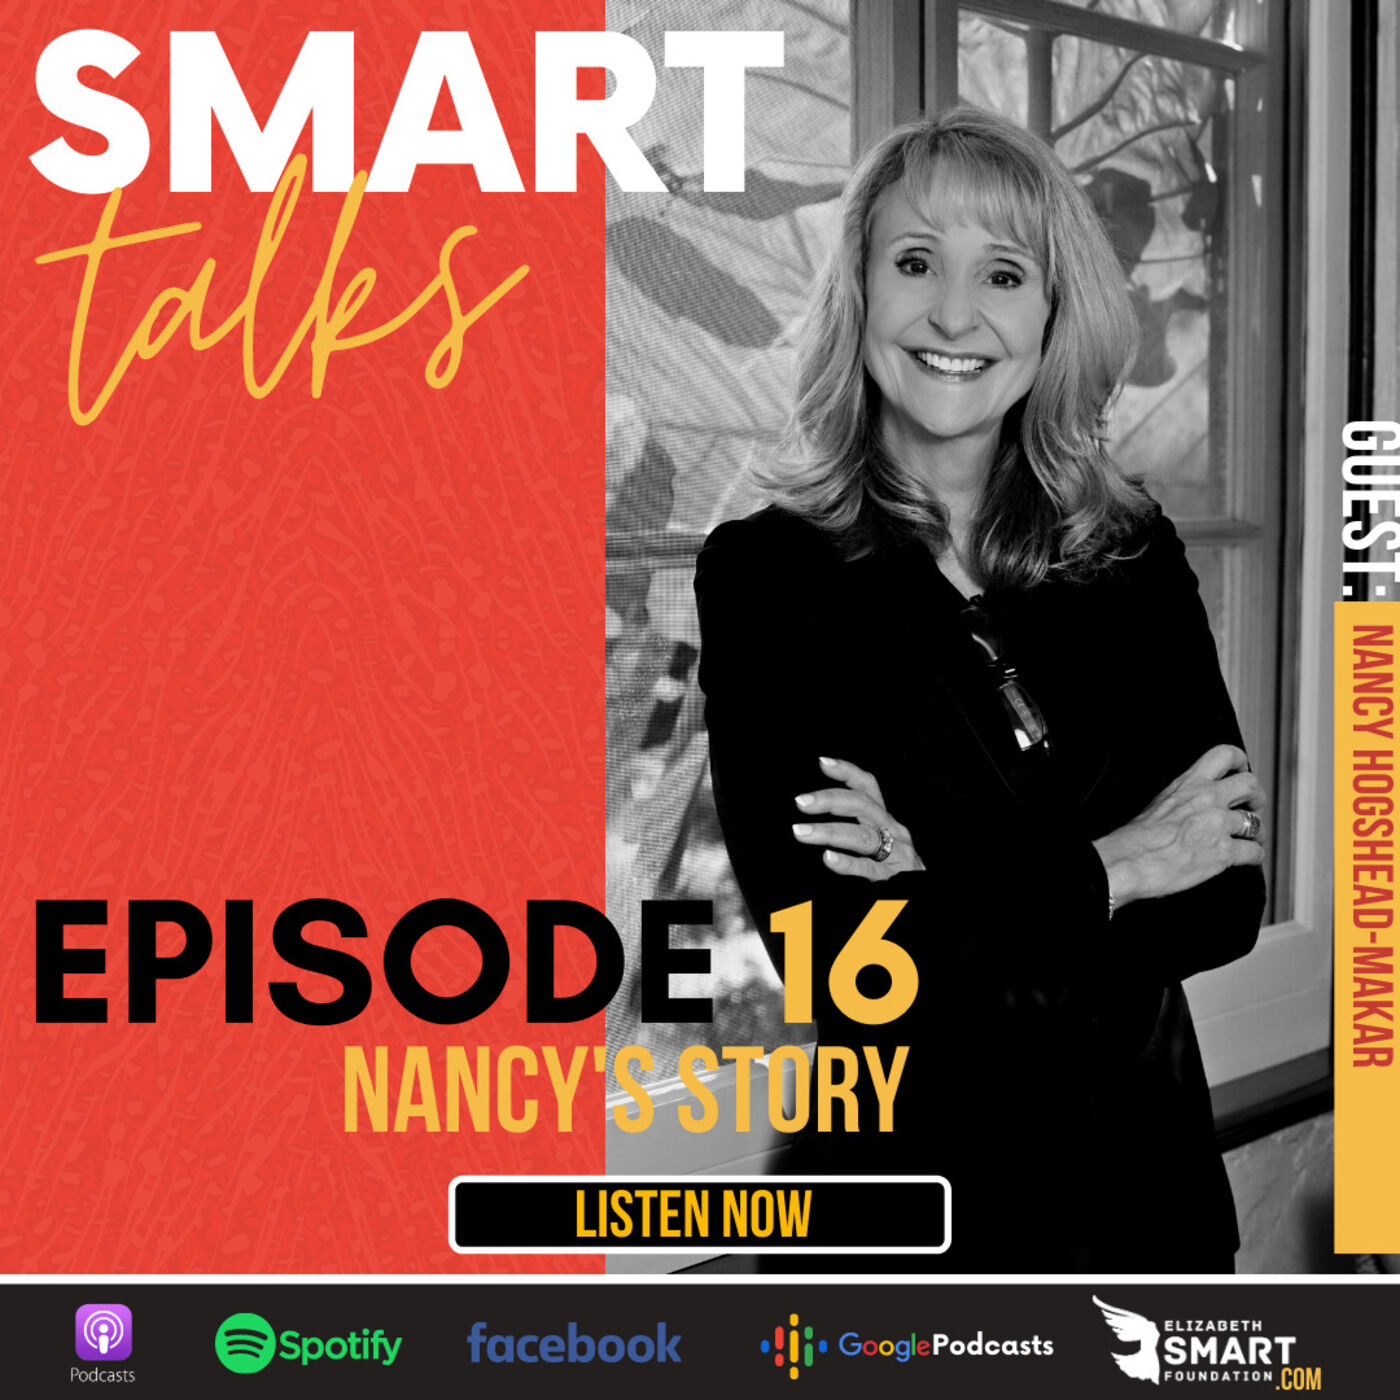 Episode 16: Nancy's Story